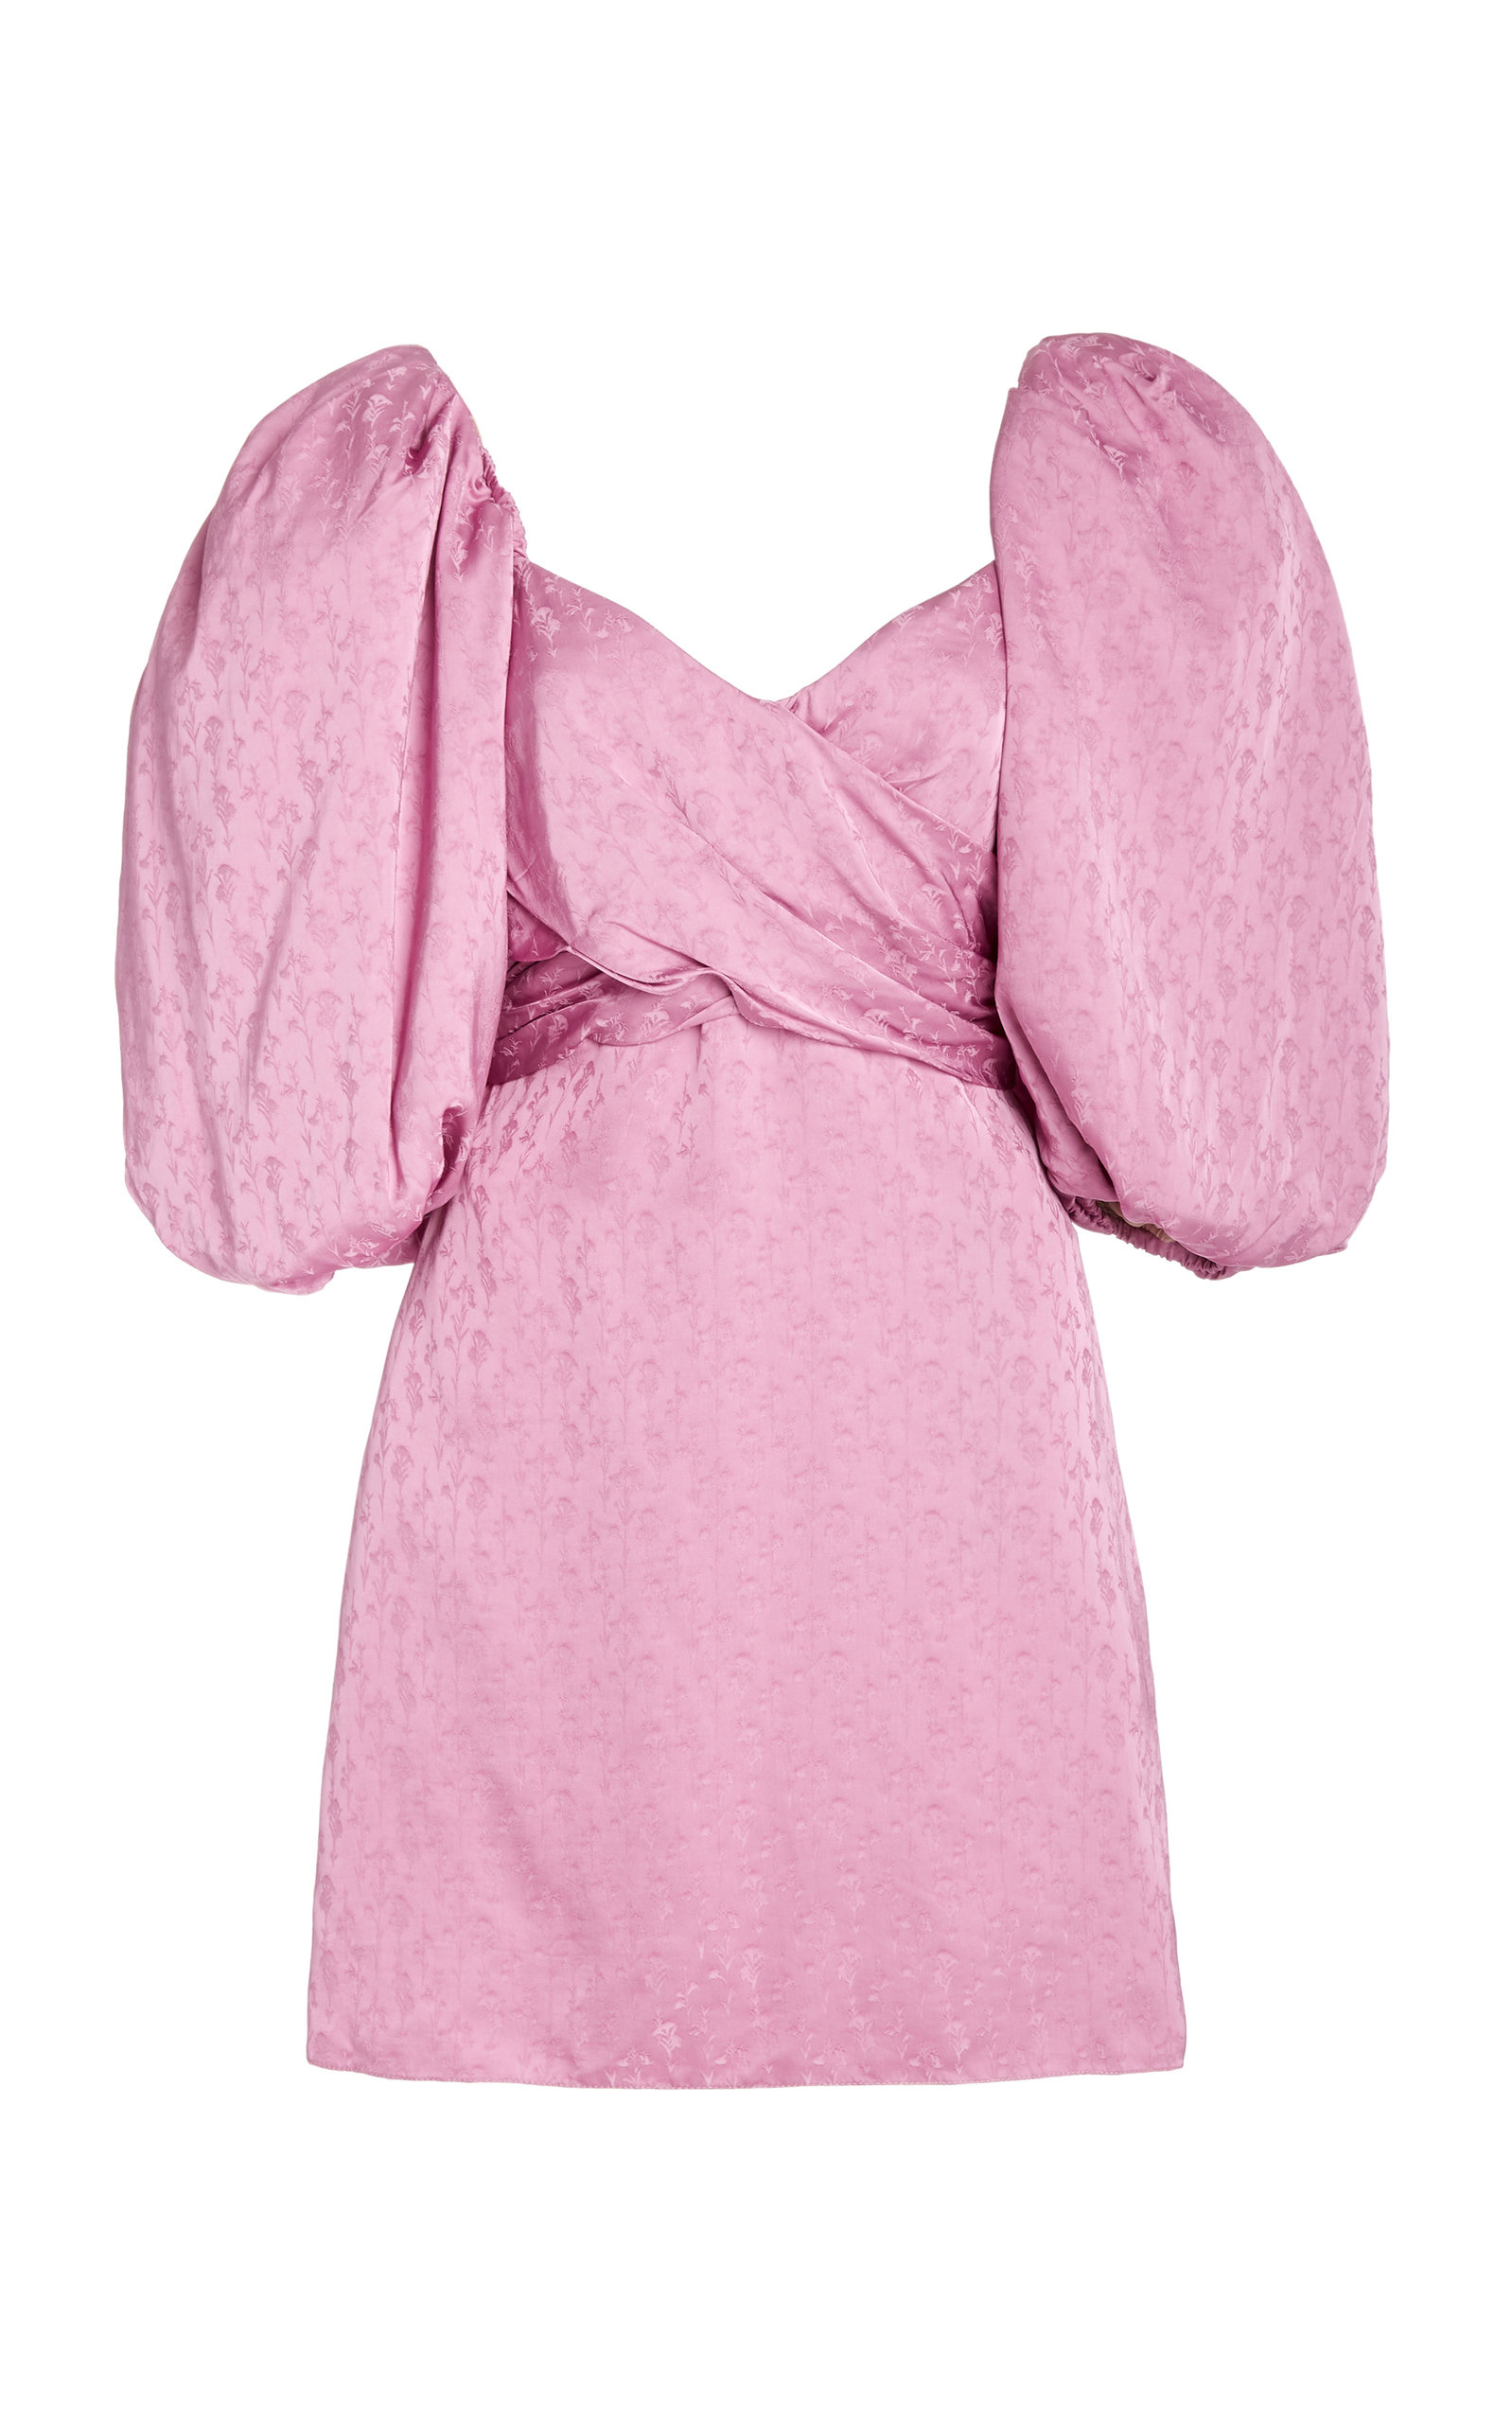 Buy Johanna Ortiz Exclusive Midnight Promises Satin-Jacquard Dress online, shop Johanna Ortiz at the best price